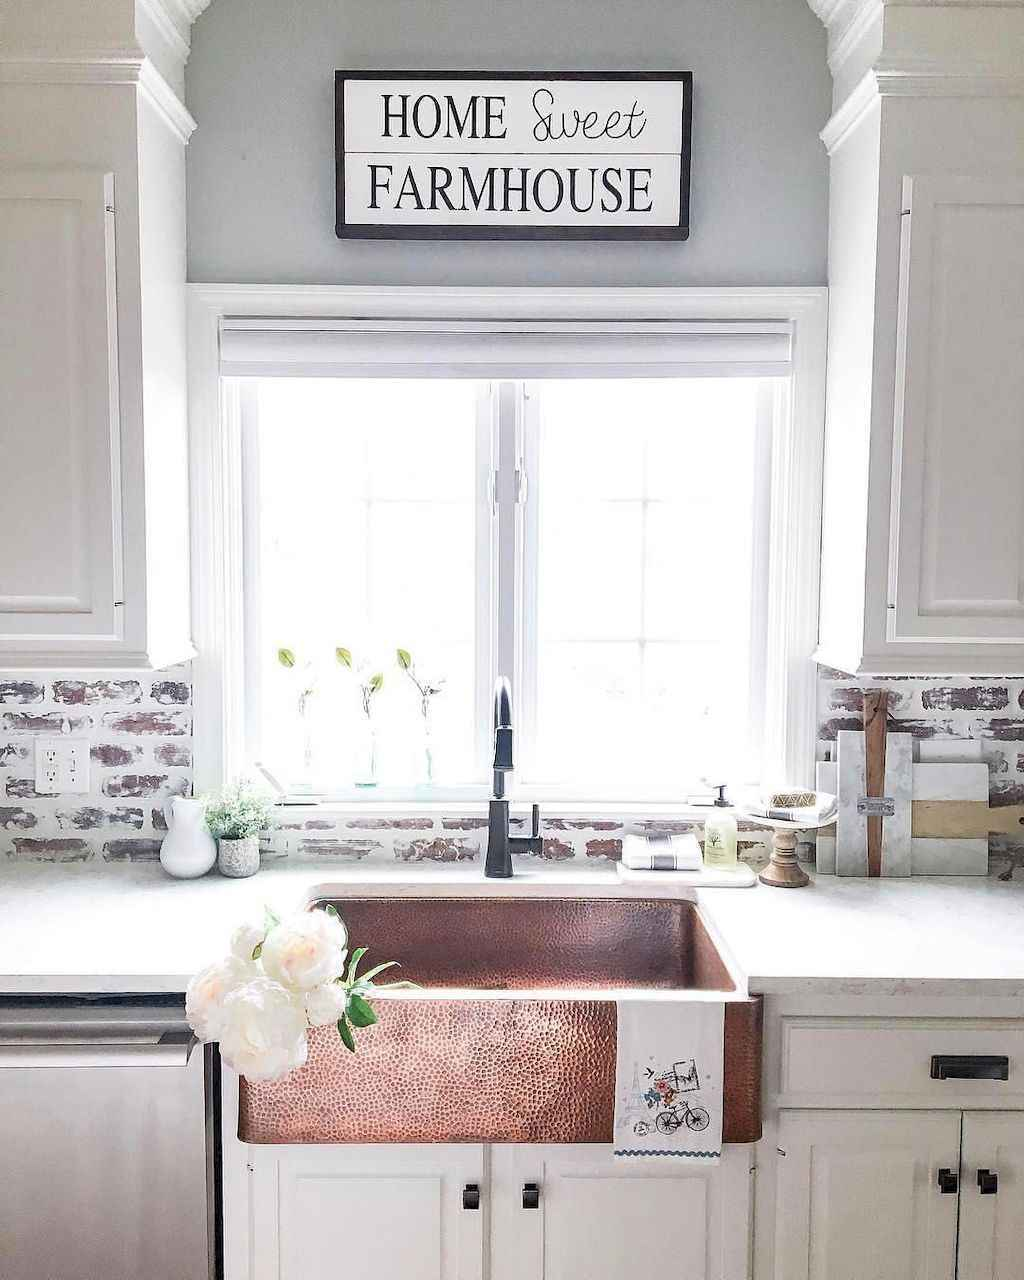 60 fancy farmhouse kitchen backsplash decor ideas 16 for Fancy kitchen decor